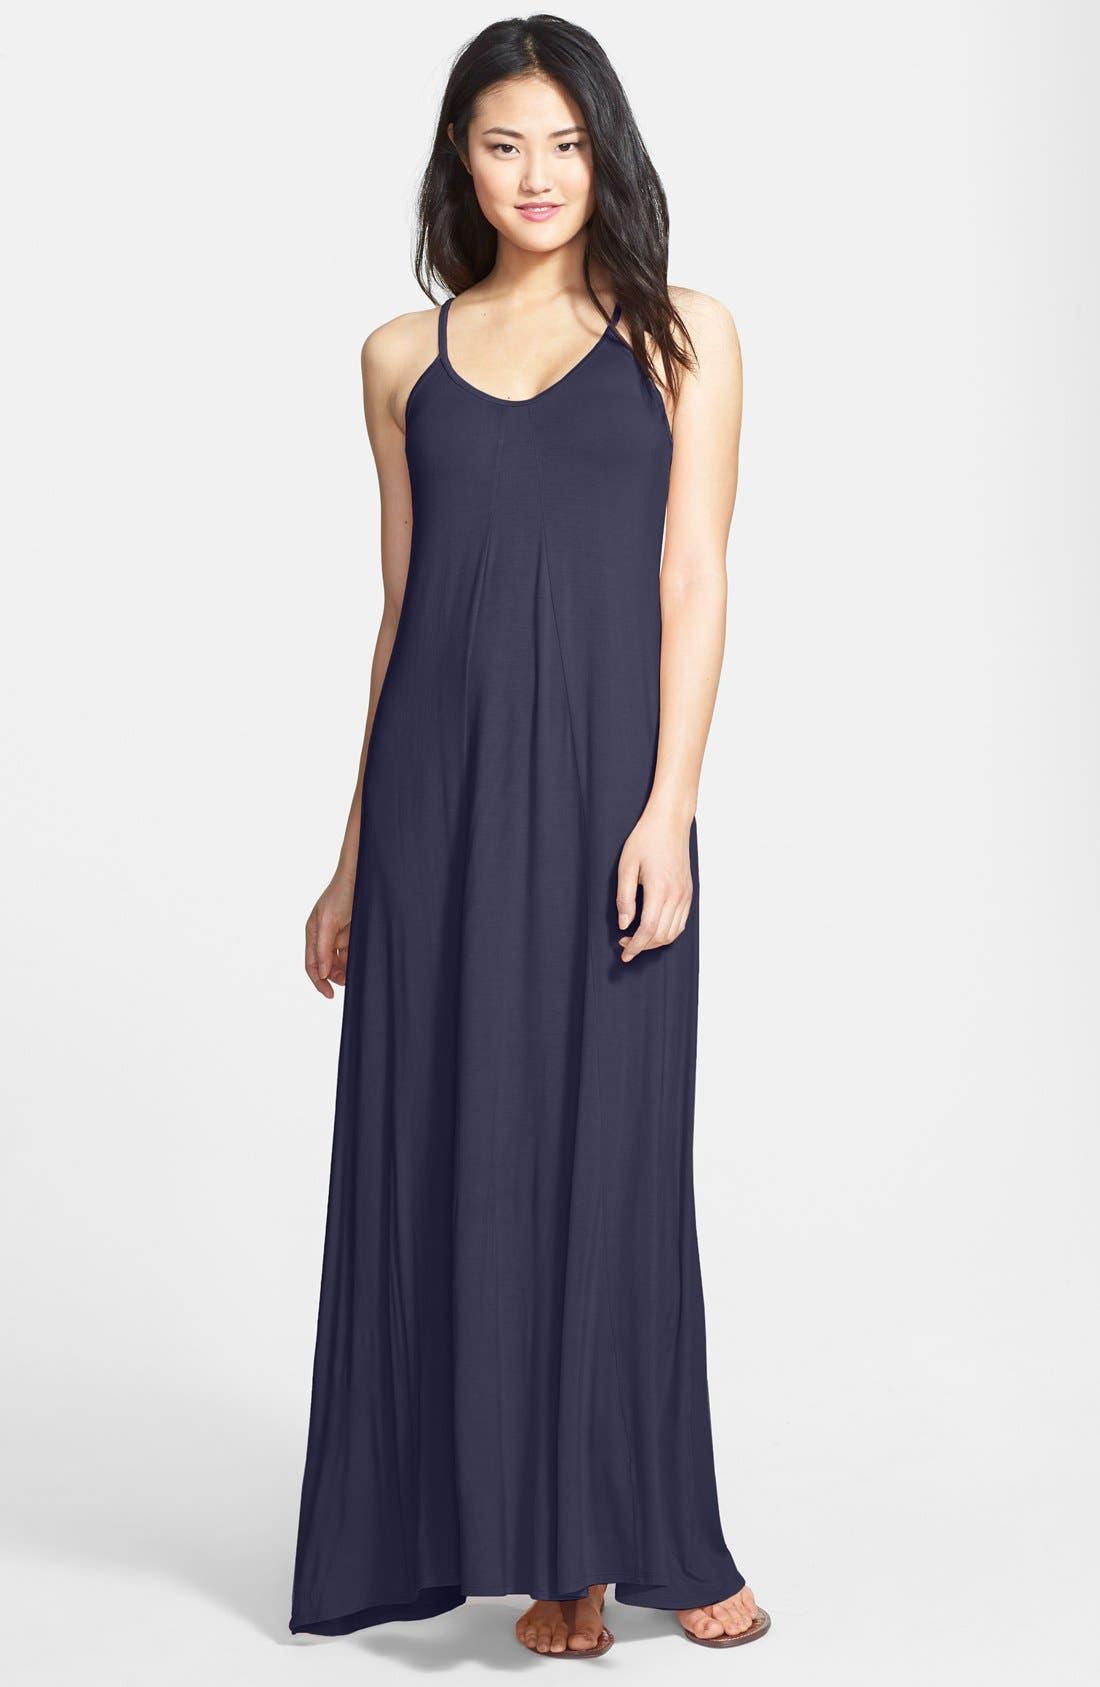 Alternate Image 1 Selected - Loveappella Maxi Dress (Regular & Petite)